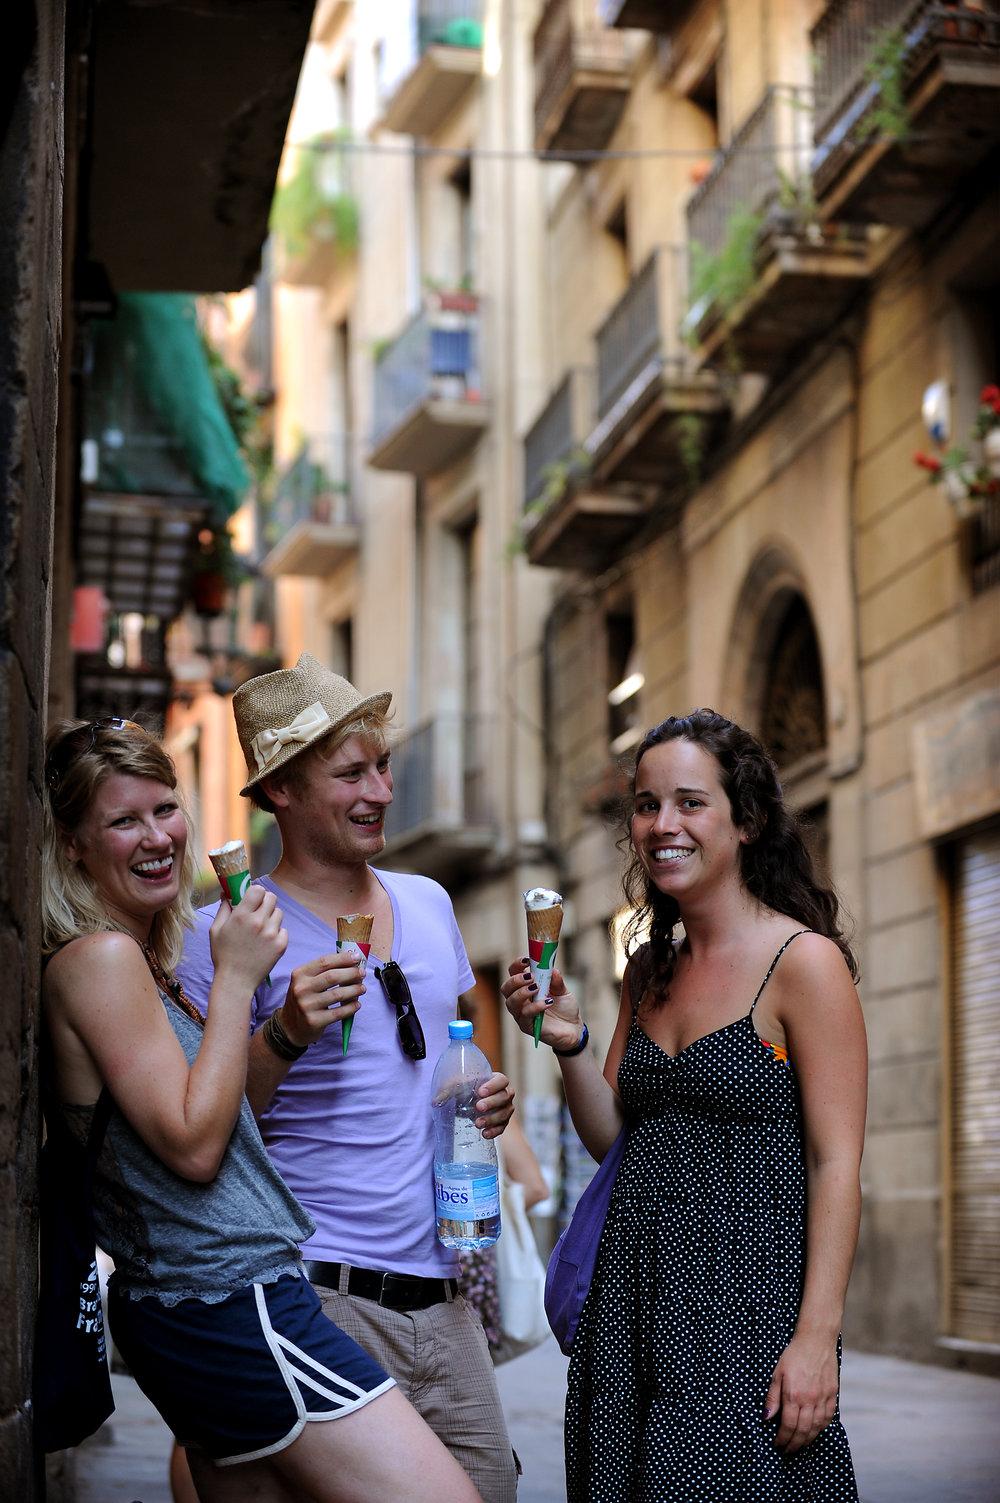 Barcelona, jäätelö, espanja